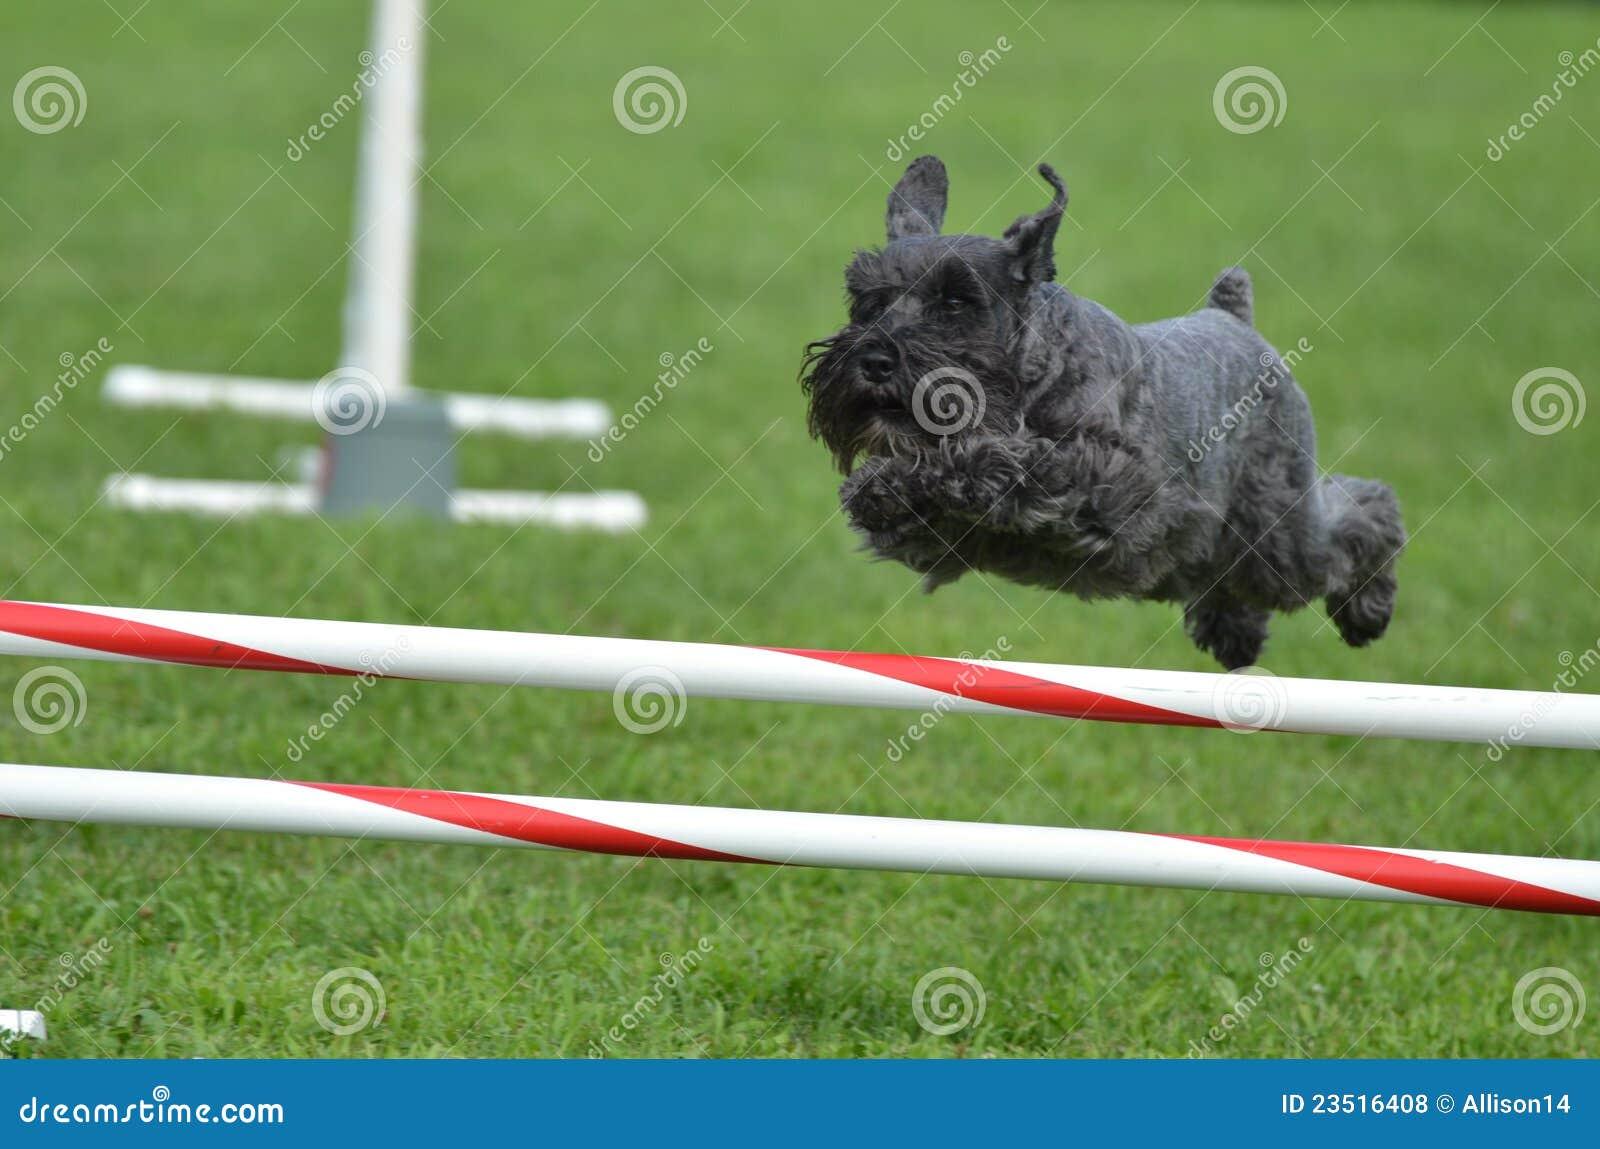 Royalty Free Stock Photos: Black Miniature Schnauzer at a Dog Agility ...